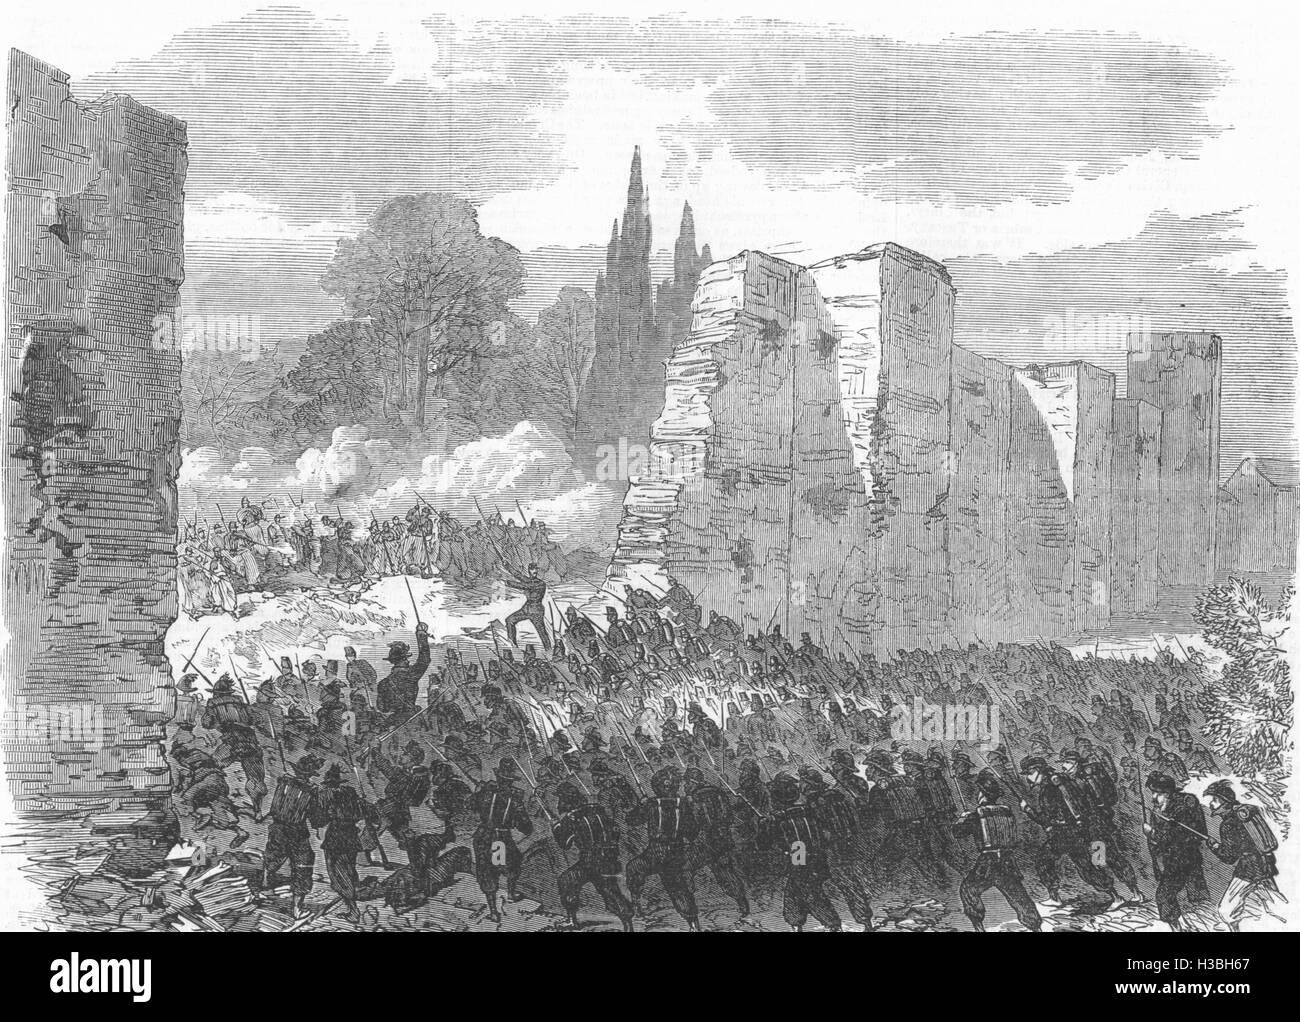 MILITARIA Italian troops storming a breach city walls at Villa Buonaparte 1870. The Illustrated London News Stock Photo